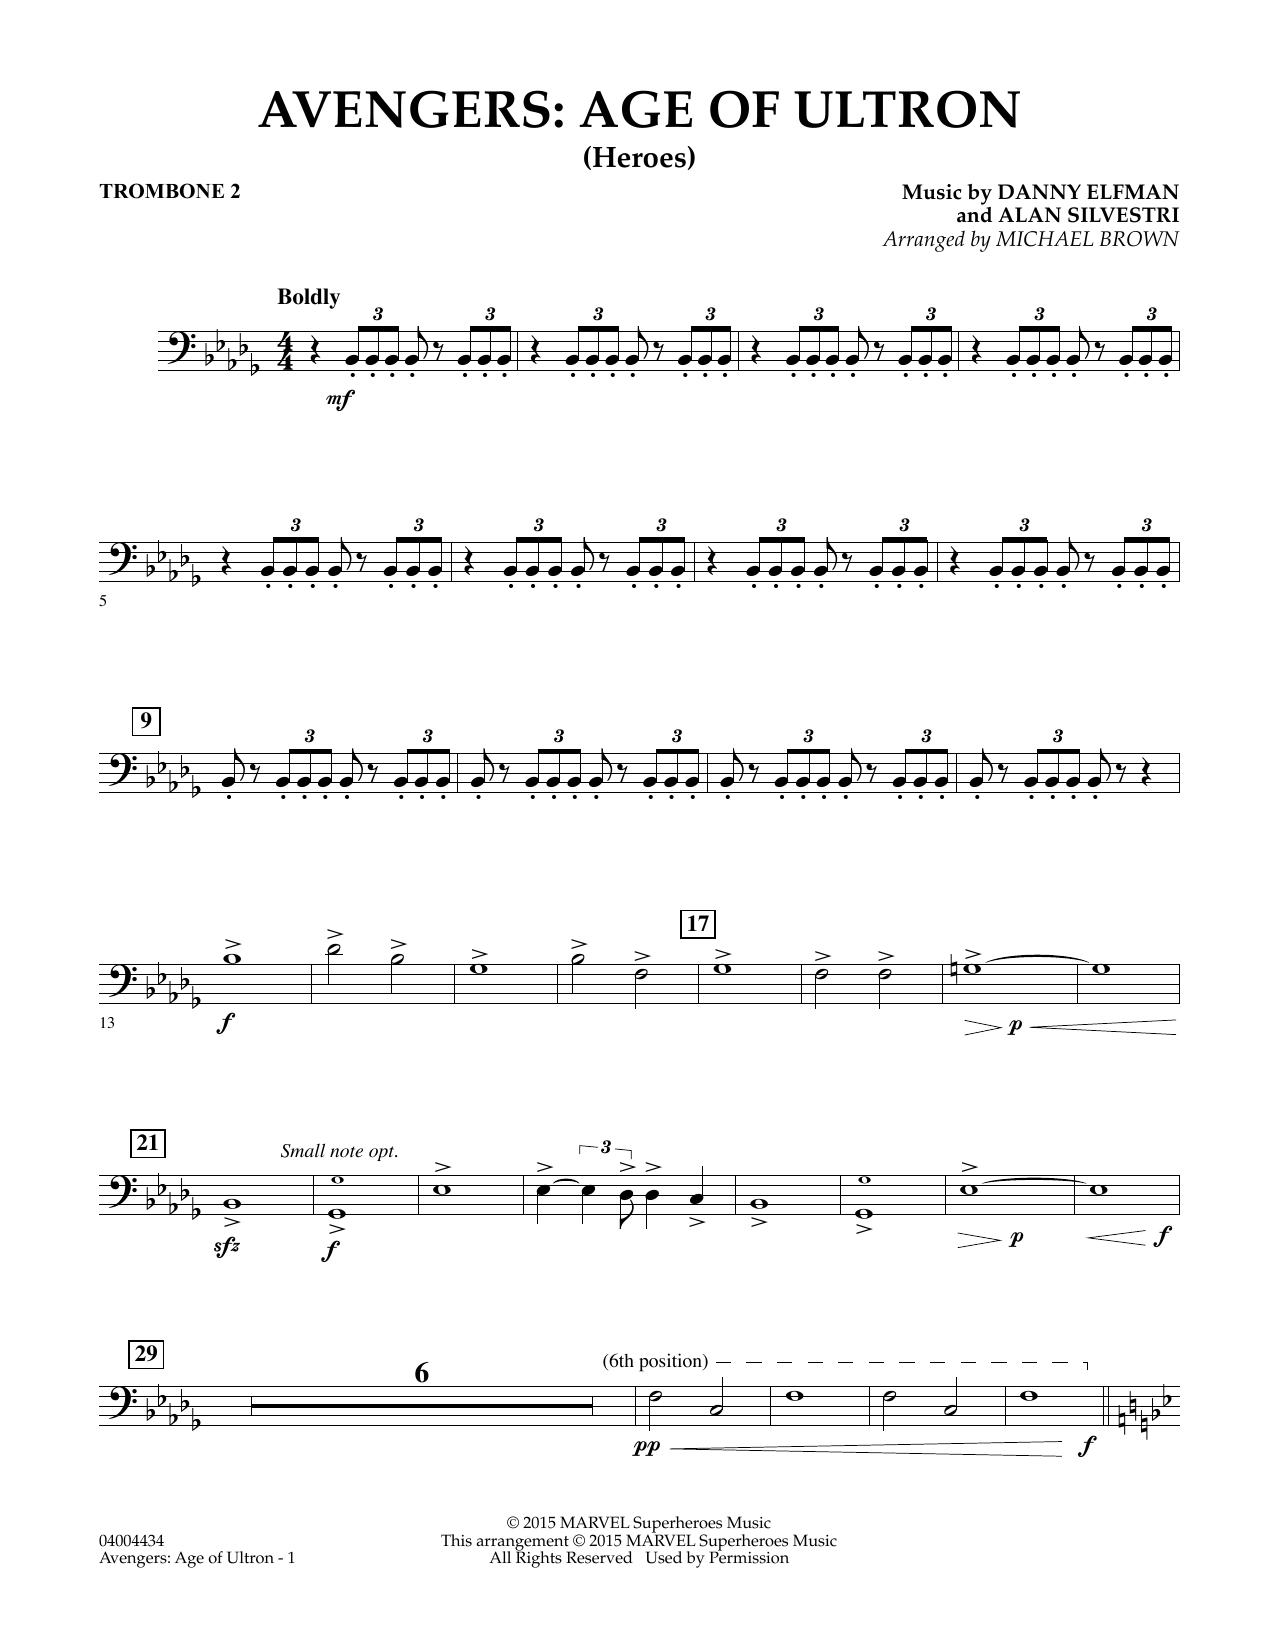 Avengers: The Age of Ultron (Main Theme) - Trombone 2